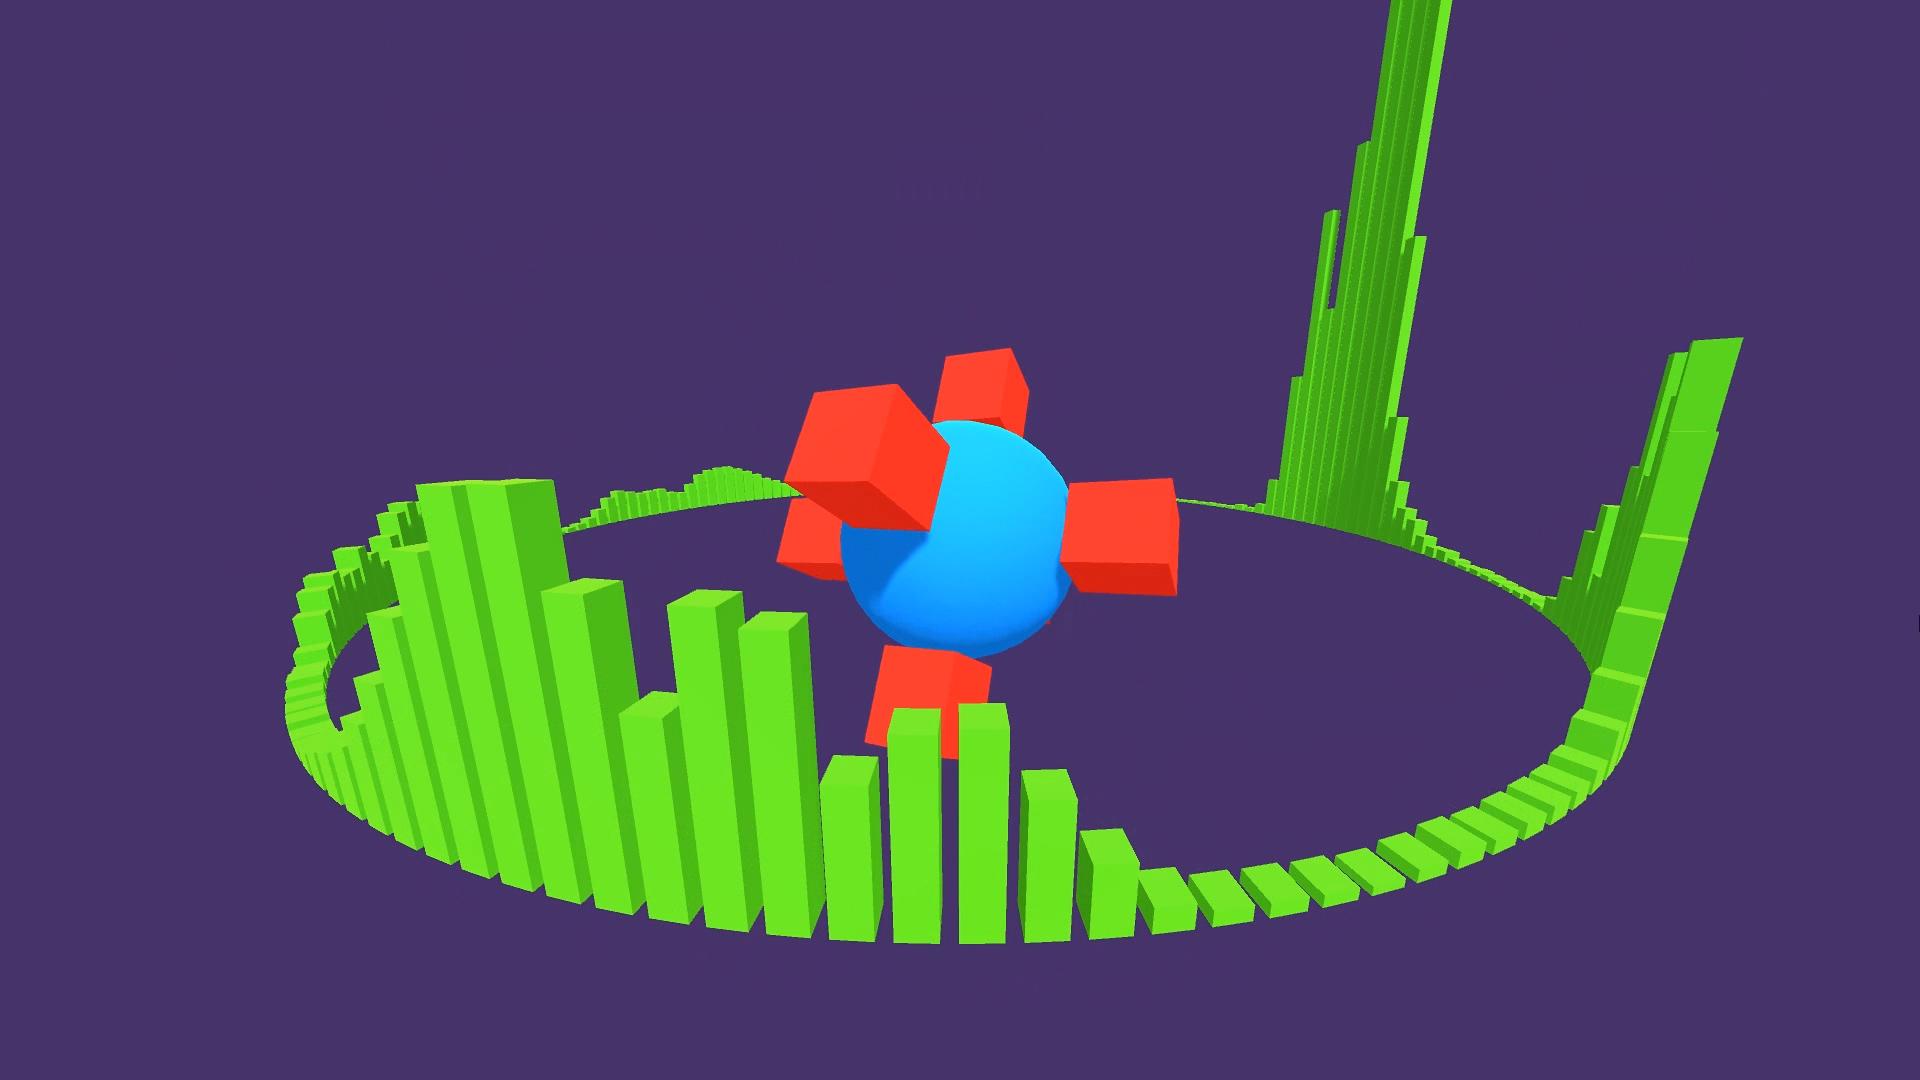 konsfik-procedural-audio-made-in-unity3d-autoplay-mode-screenshot-3